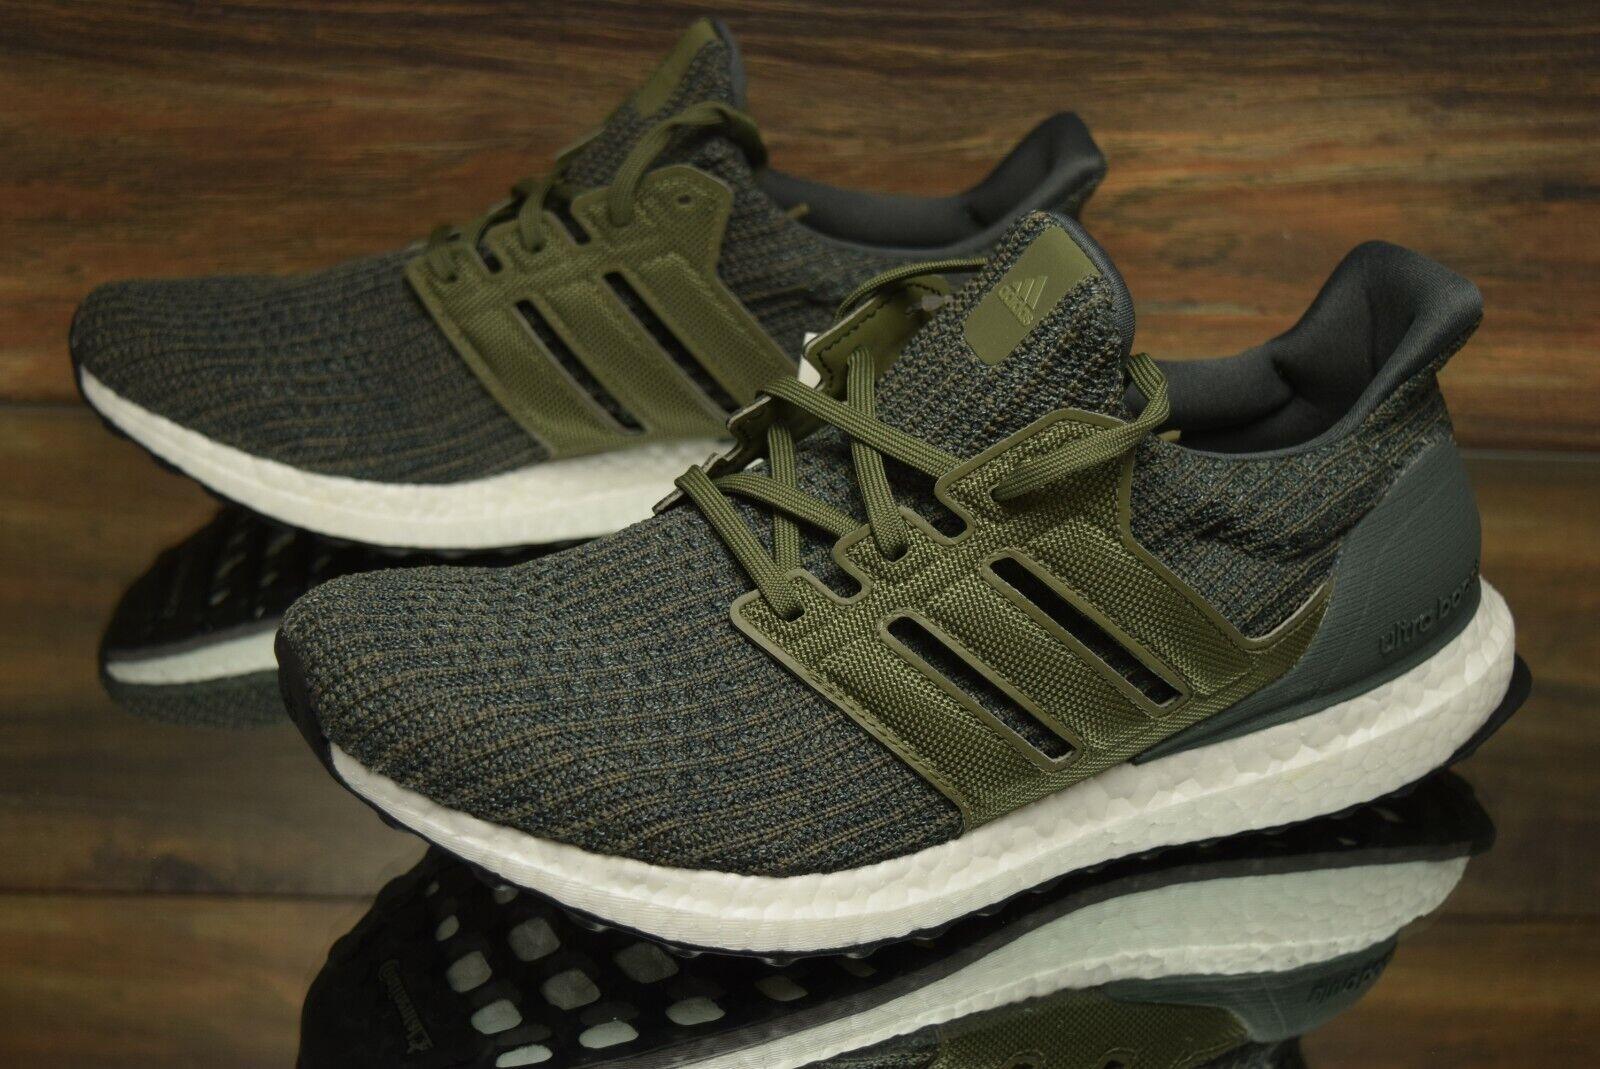 Adidas Men's UltraBOOST Running Shoes Legend Ivy Khaki DB2833 Multi Size NEW